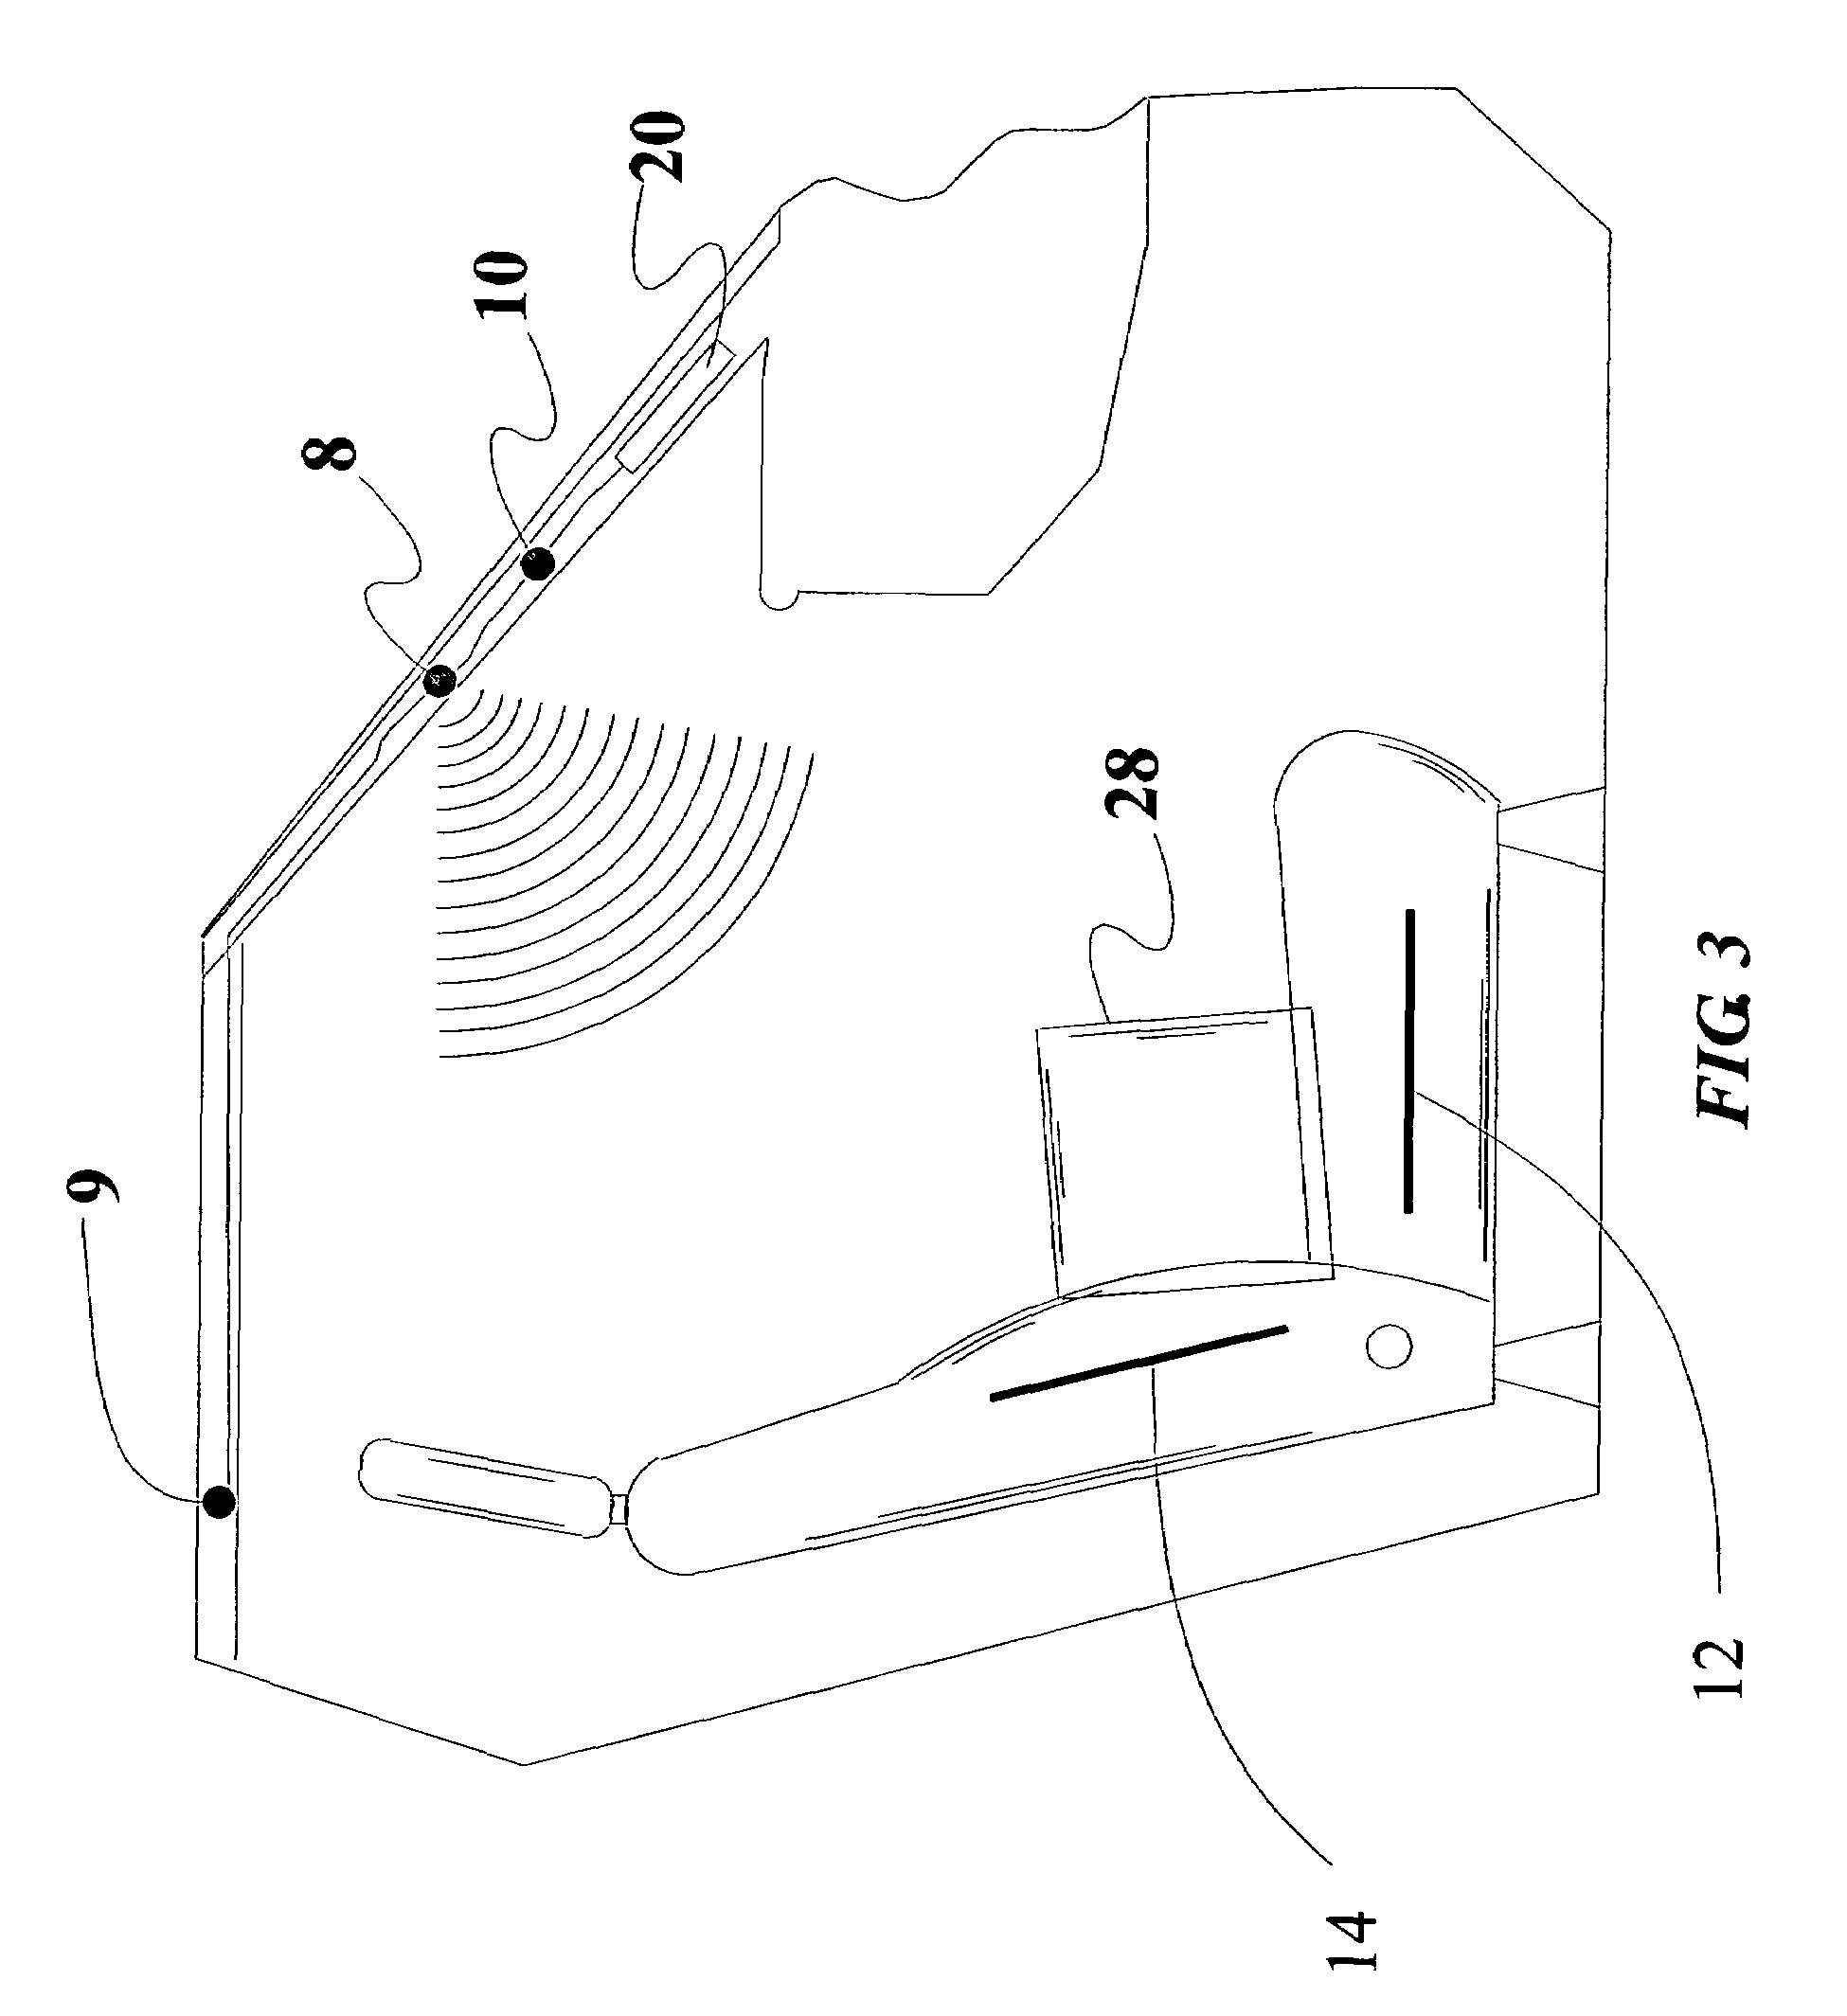 Diagram Illustrates The Circuits Between The 1998 Jaguar Xjr Stereo